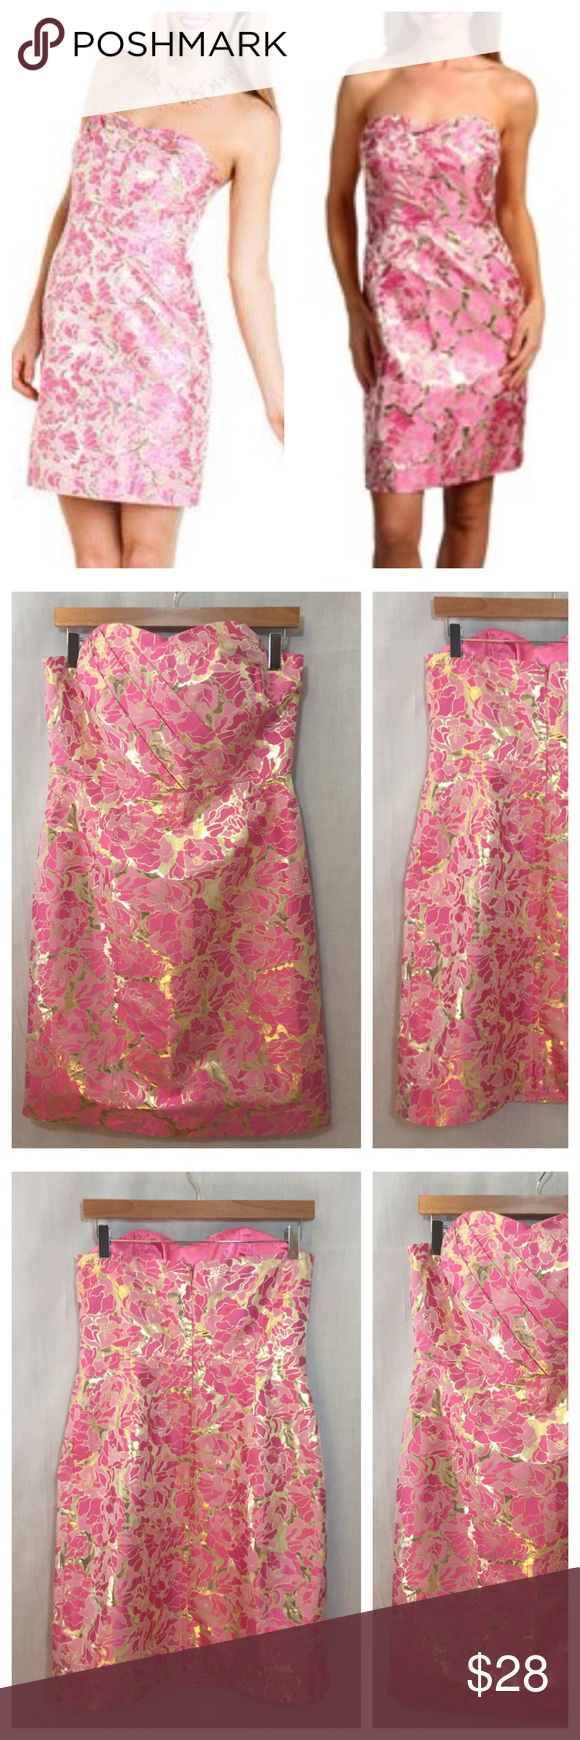 Lilly Pulitzer Raya Floral Silk Jacquard Dress 10